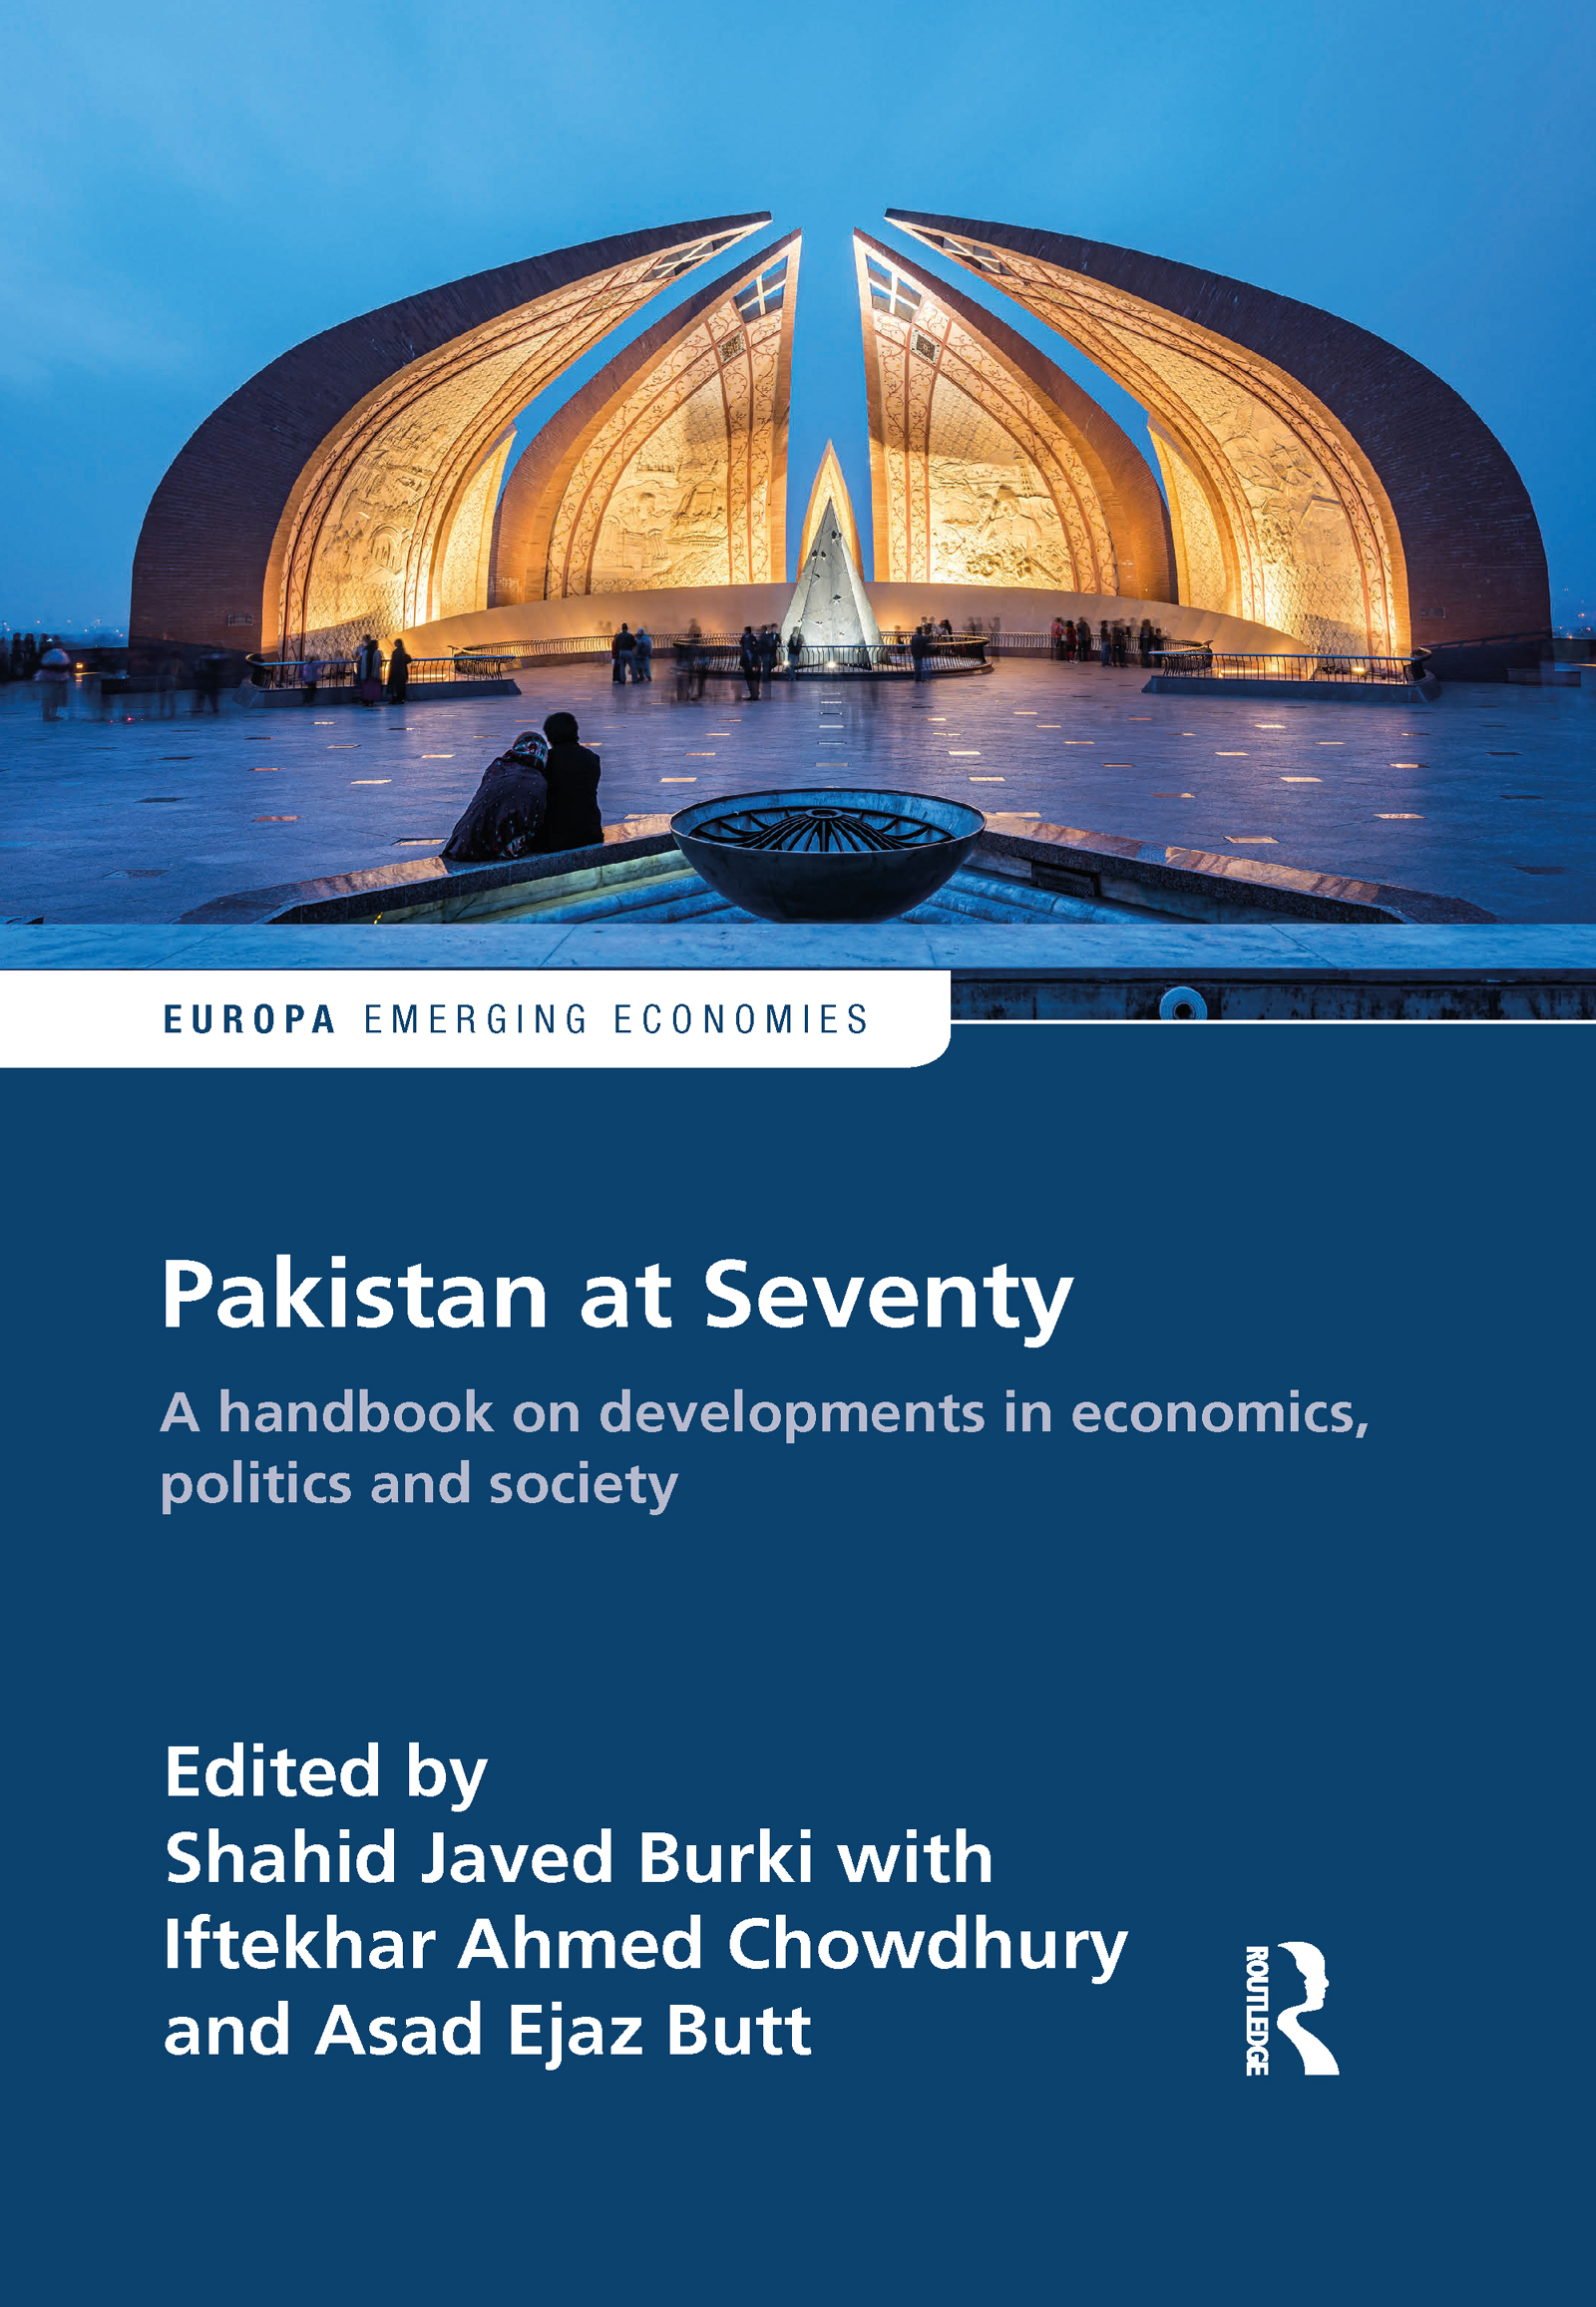 Pakistan at Seventy